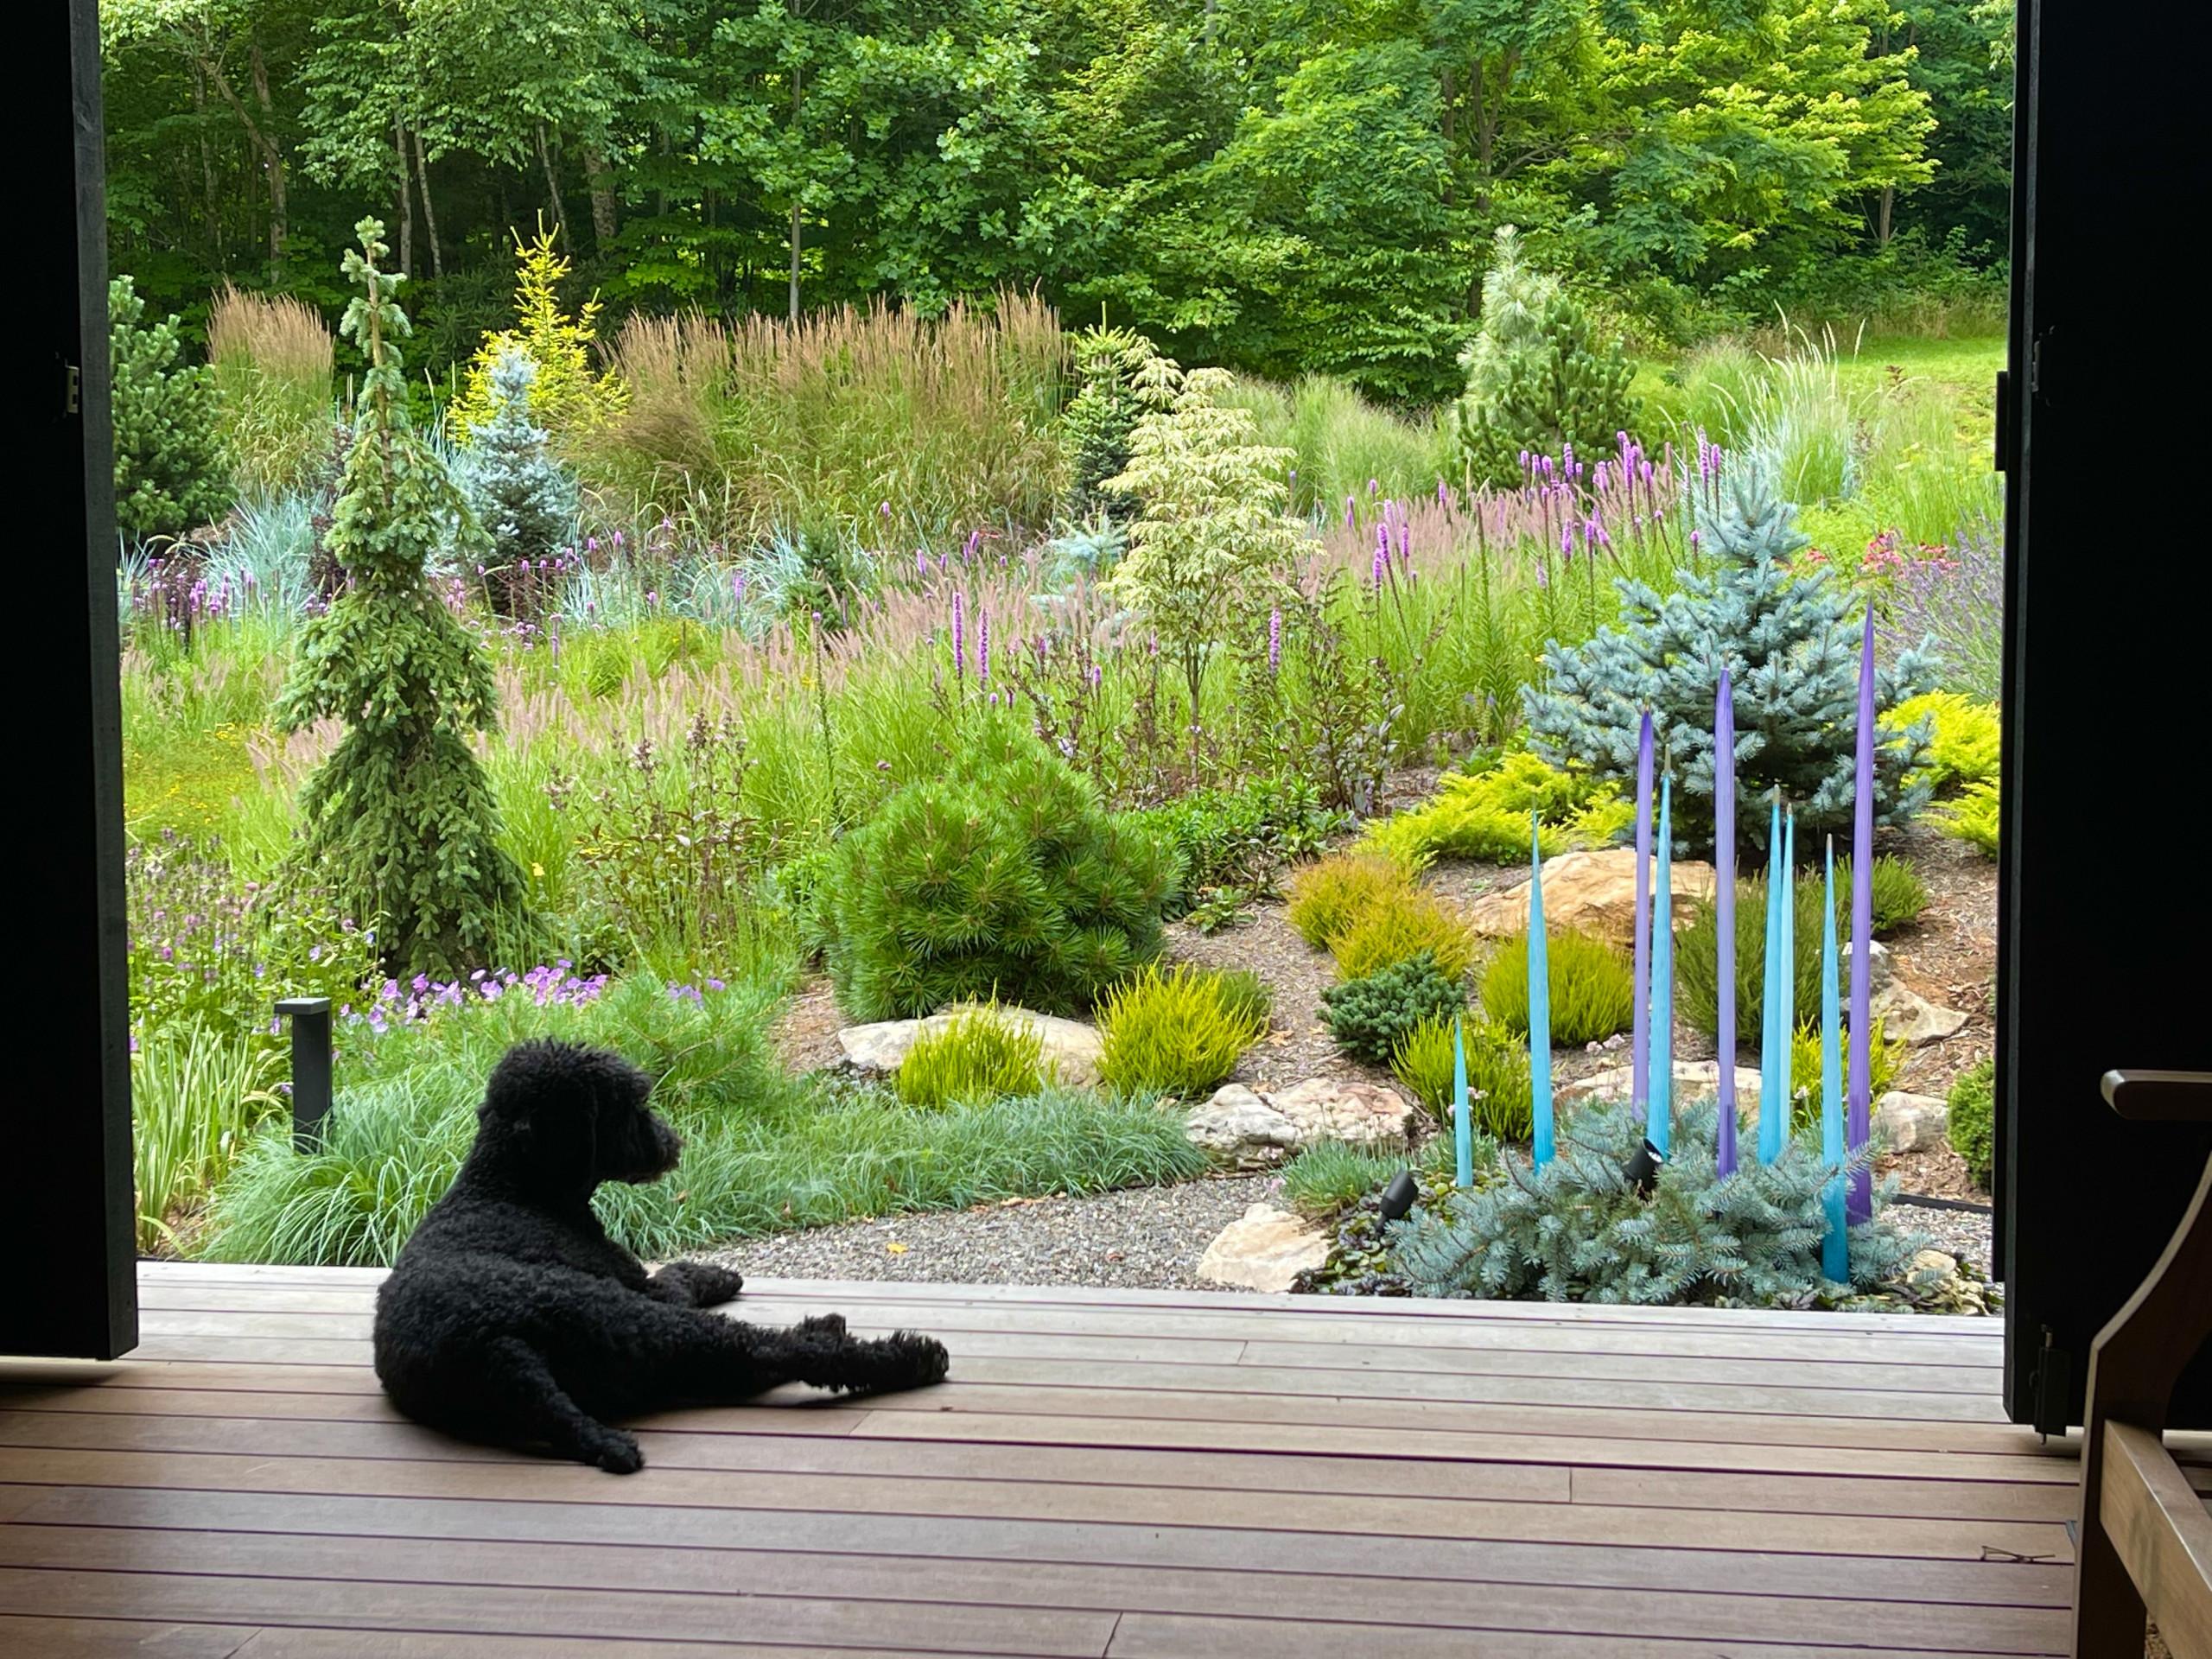 Dog and dogtrot:  Amador surveys the garden.